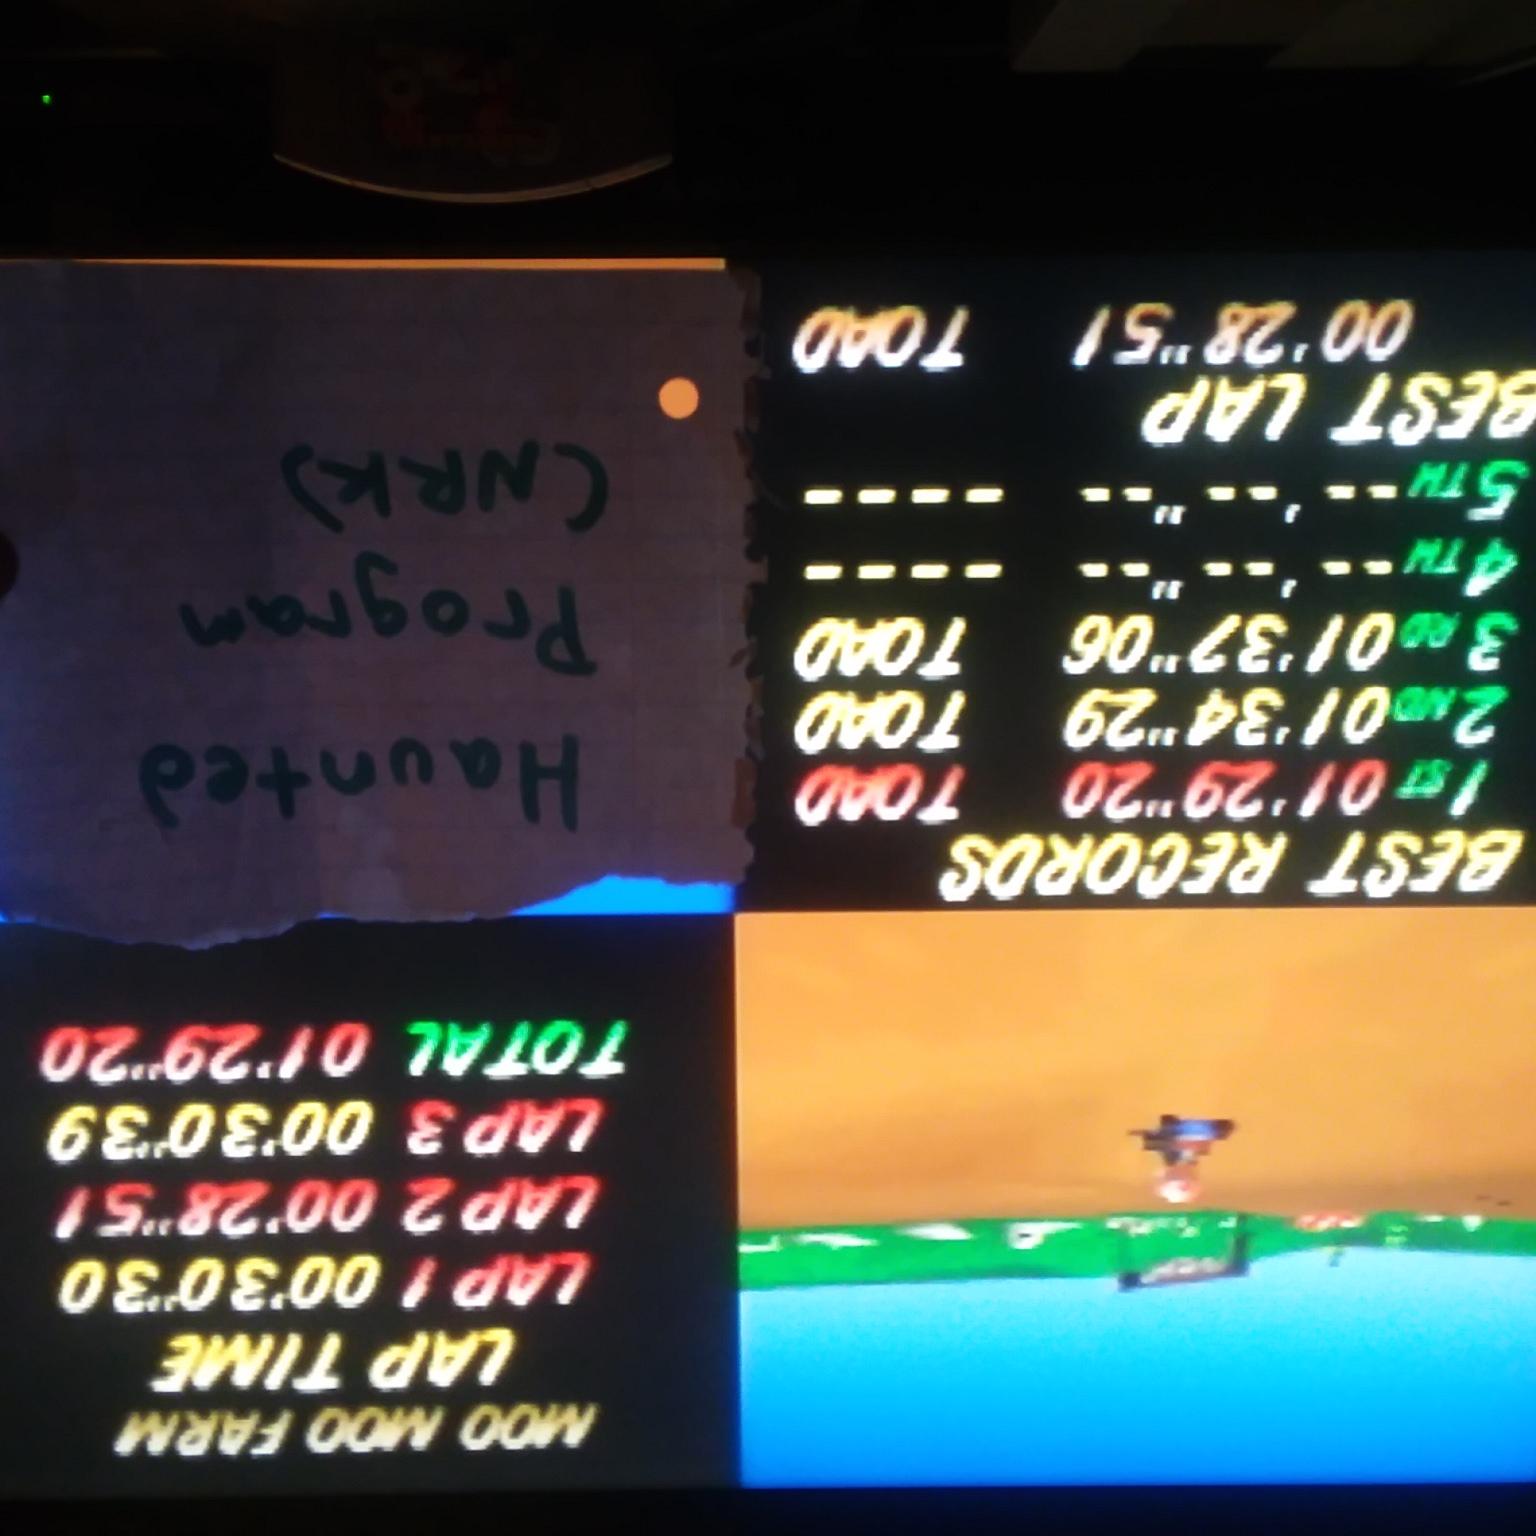 Mario Kart 64: Moo Moo Farm [Time Trial] time of 0:01:29.2